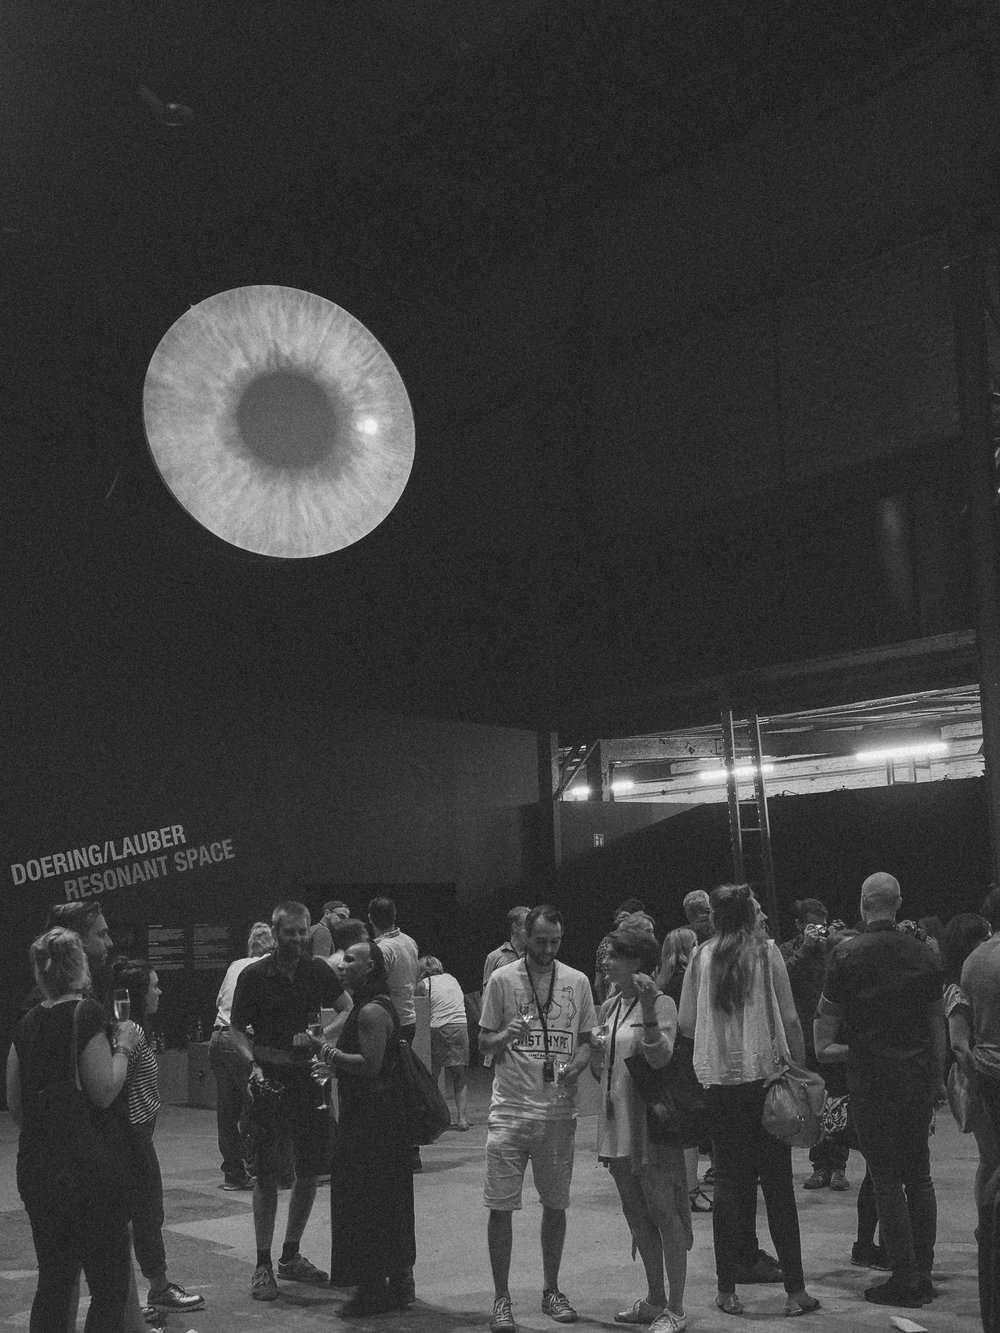 olympus-perspective-playground-wearecity-koeln-2016-athenea-diapoulis-46.jpg